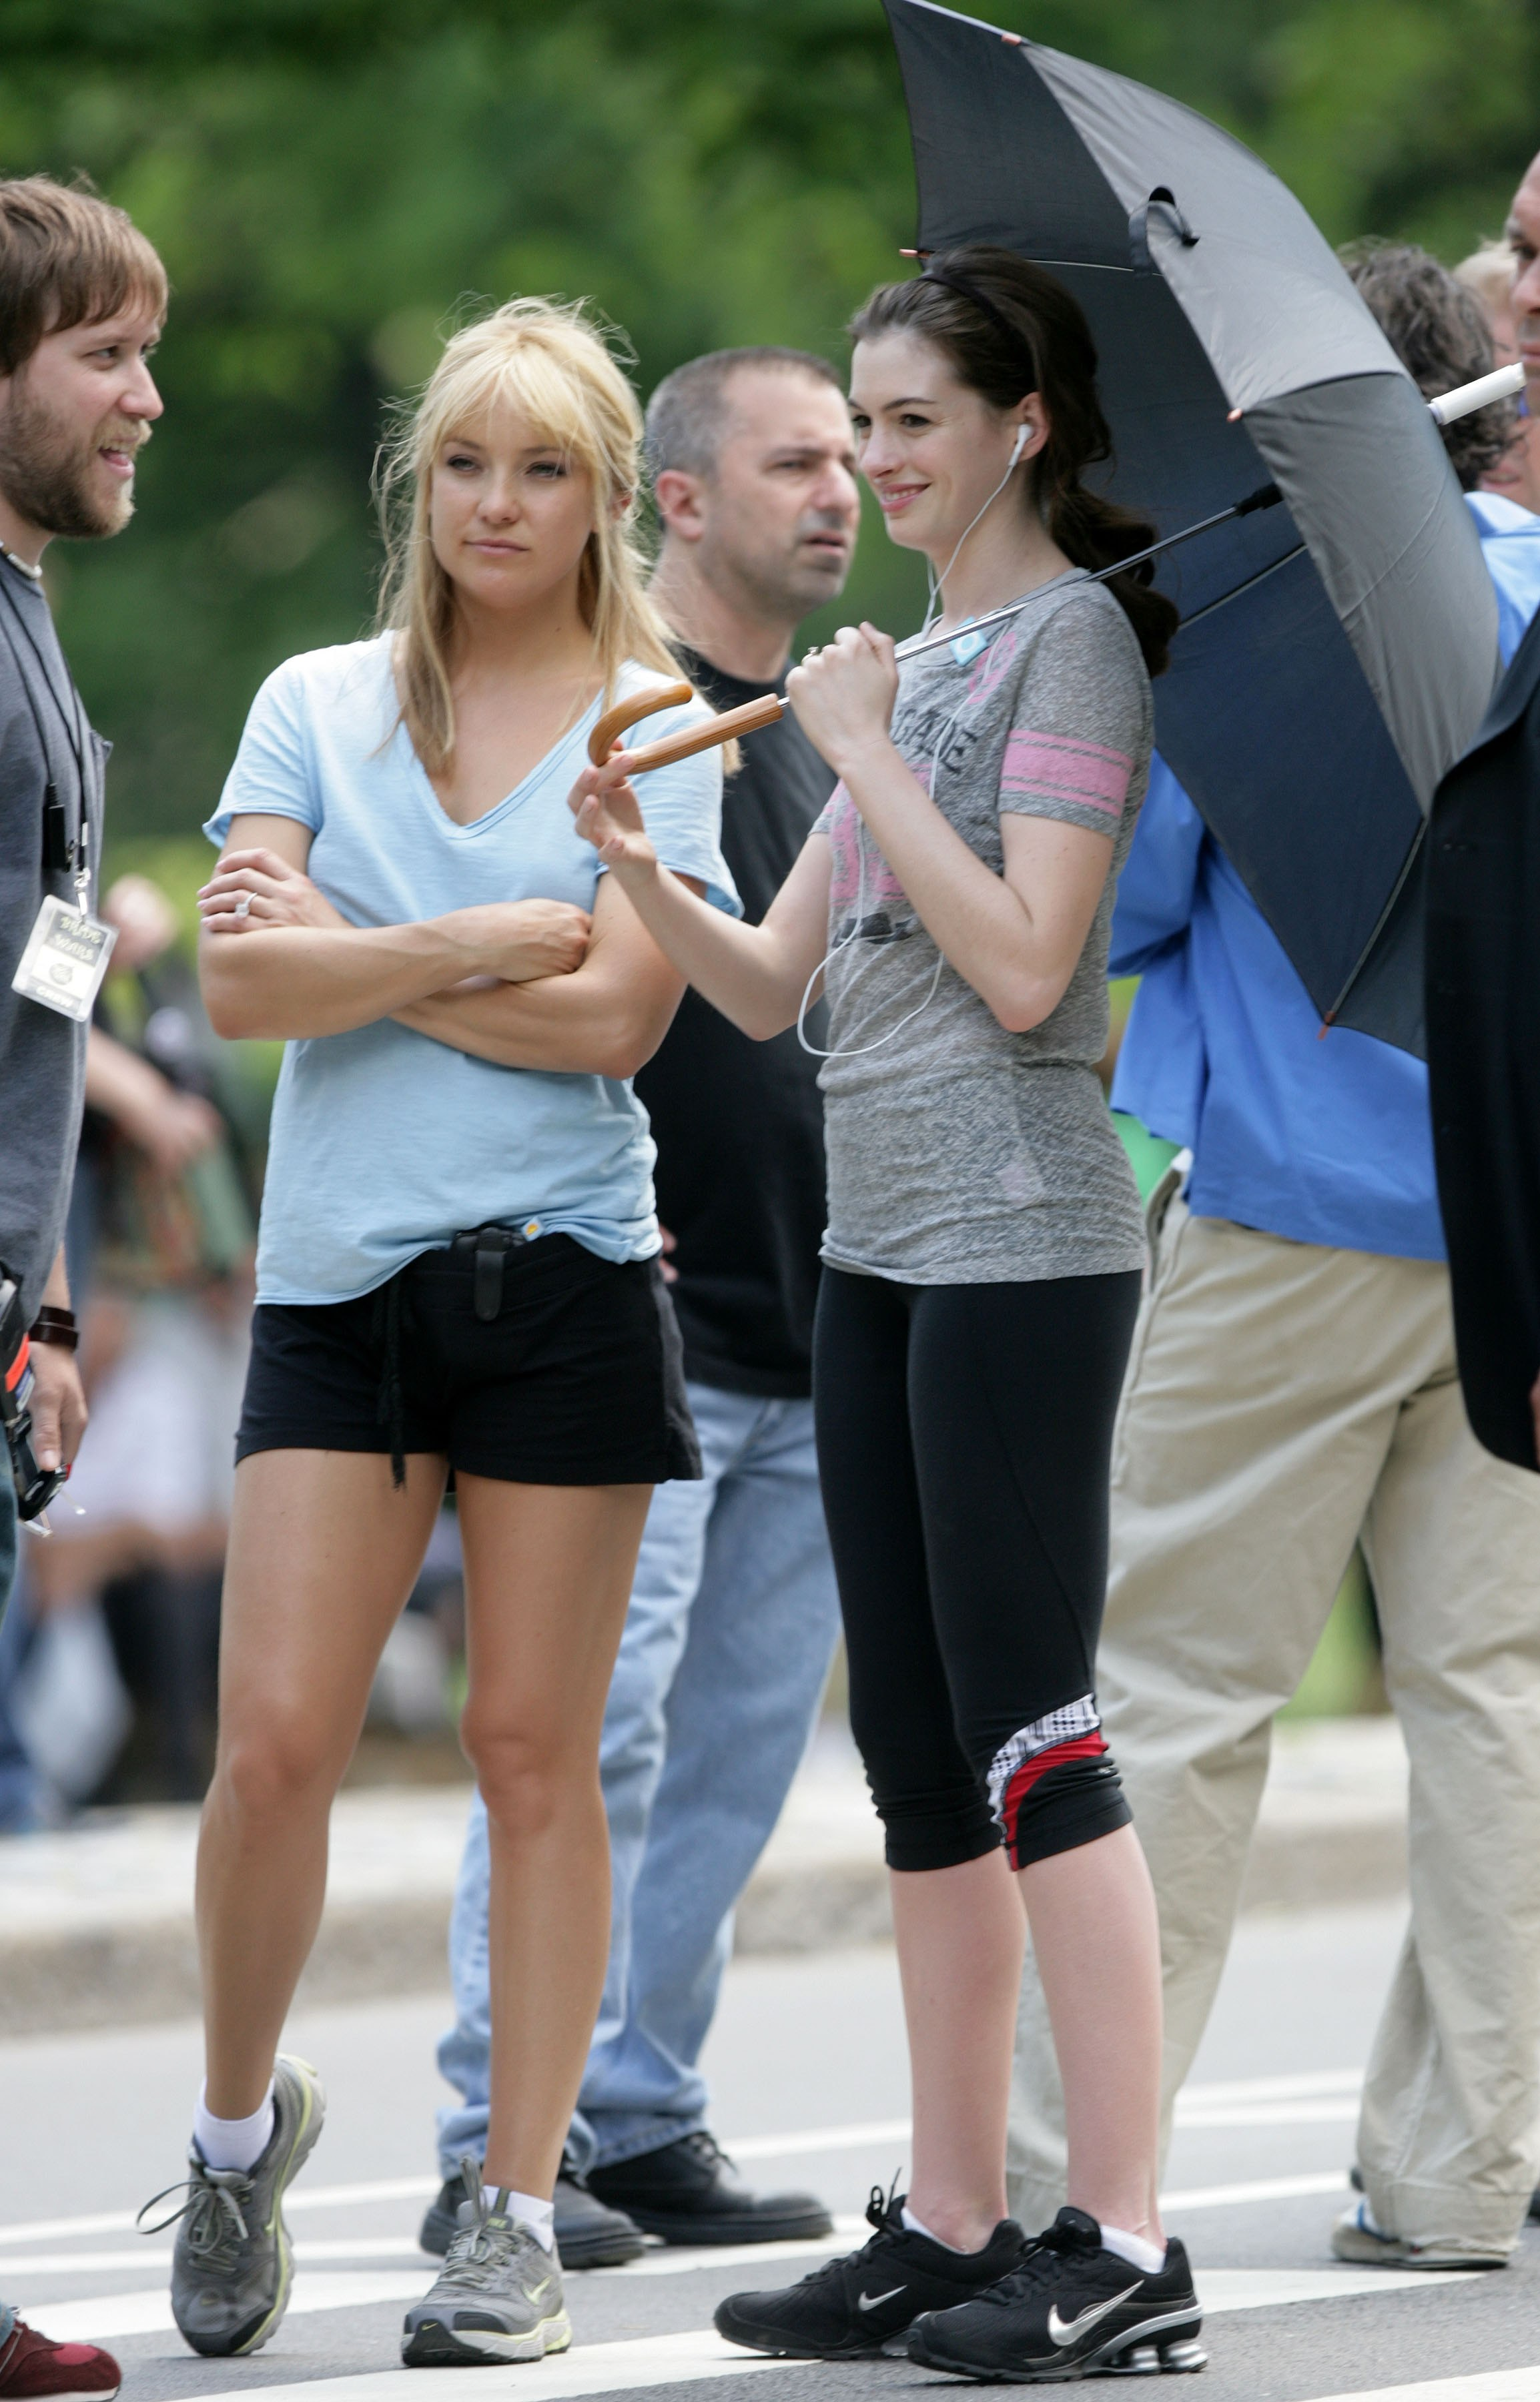 61600_Kate_Hudson_and_Anne_Hathaway_shade_under_an_umbrella_CU_ISA_030608_03_122_901lo.jpg